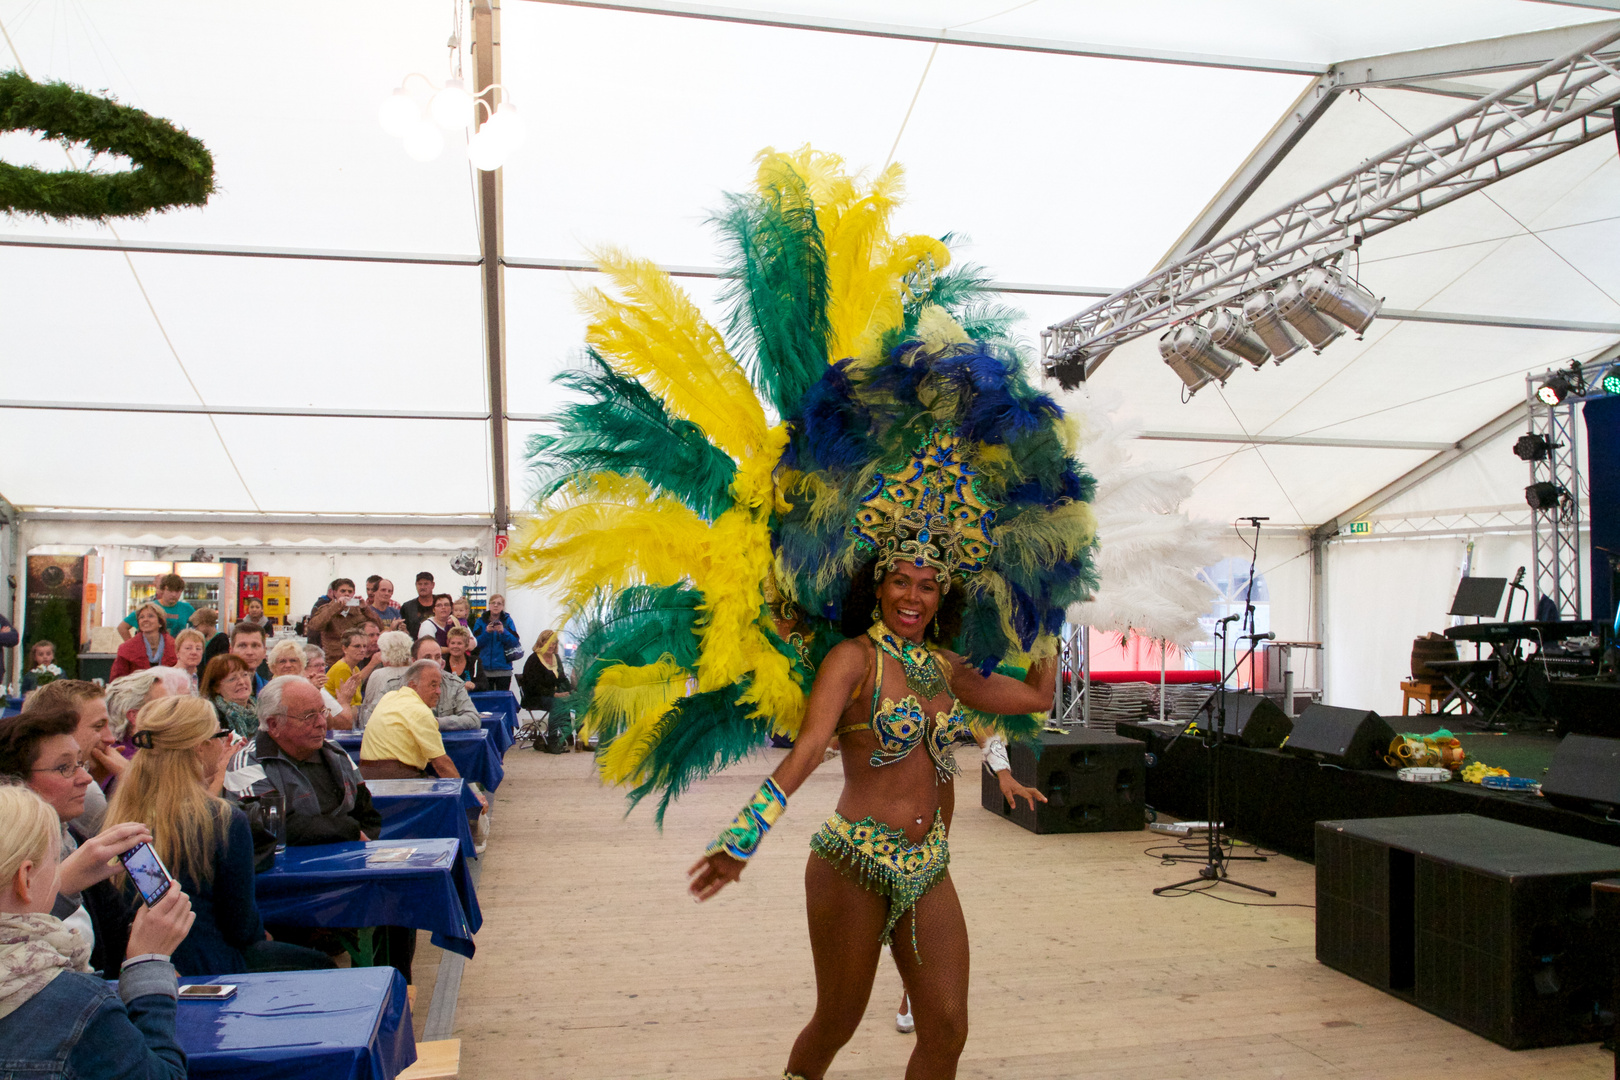 Copacabana-Sambashow Nr. 4609